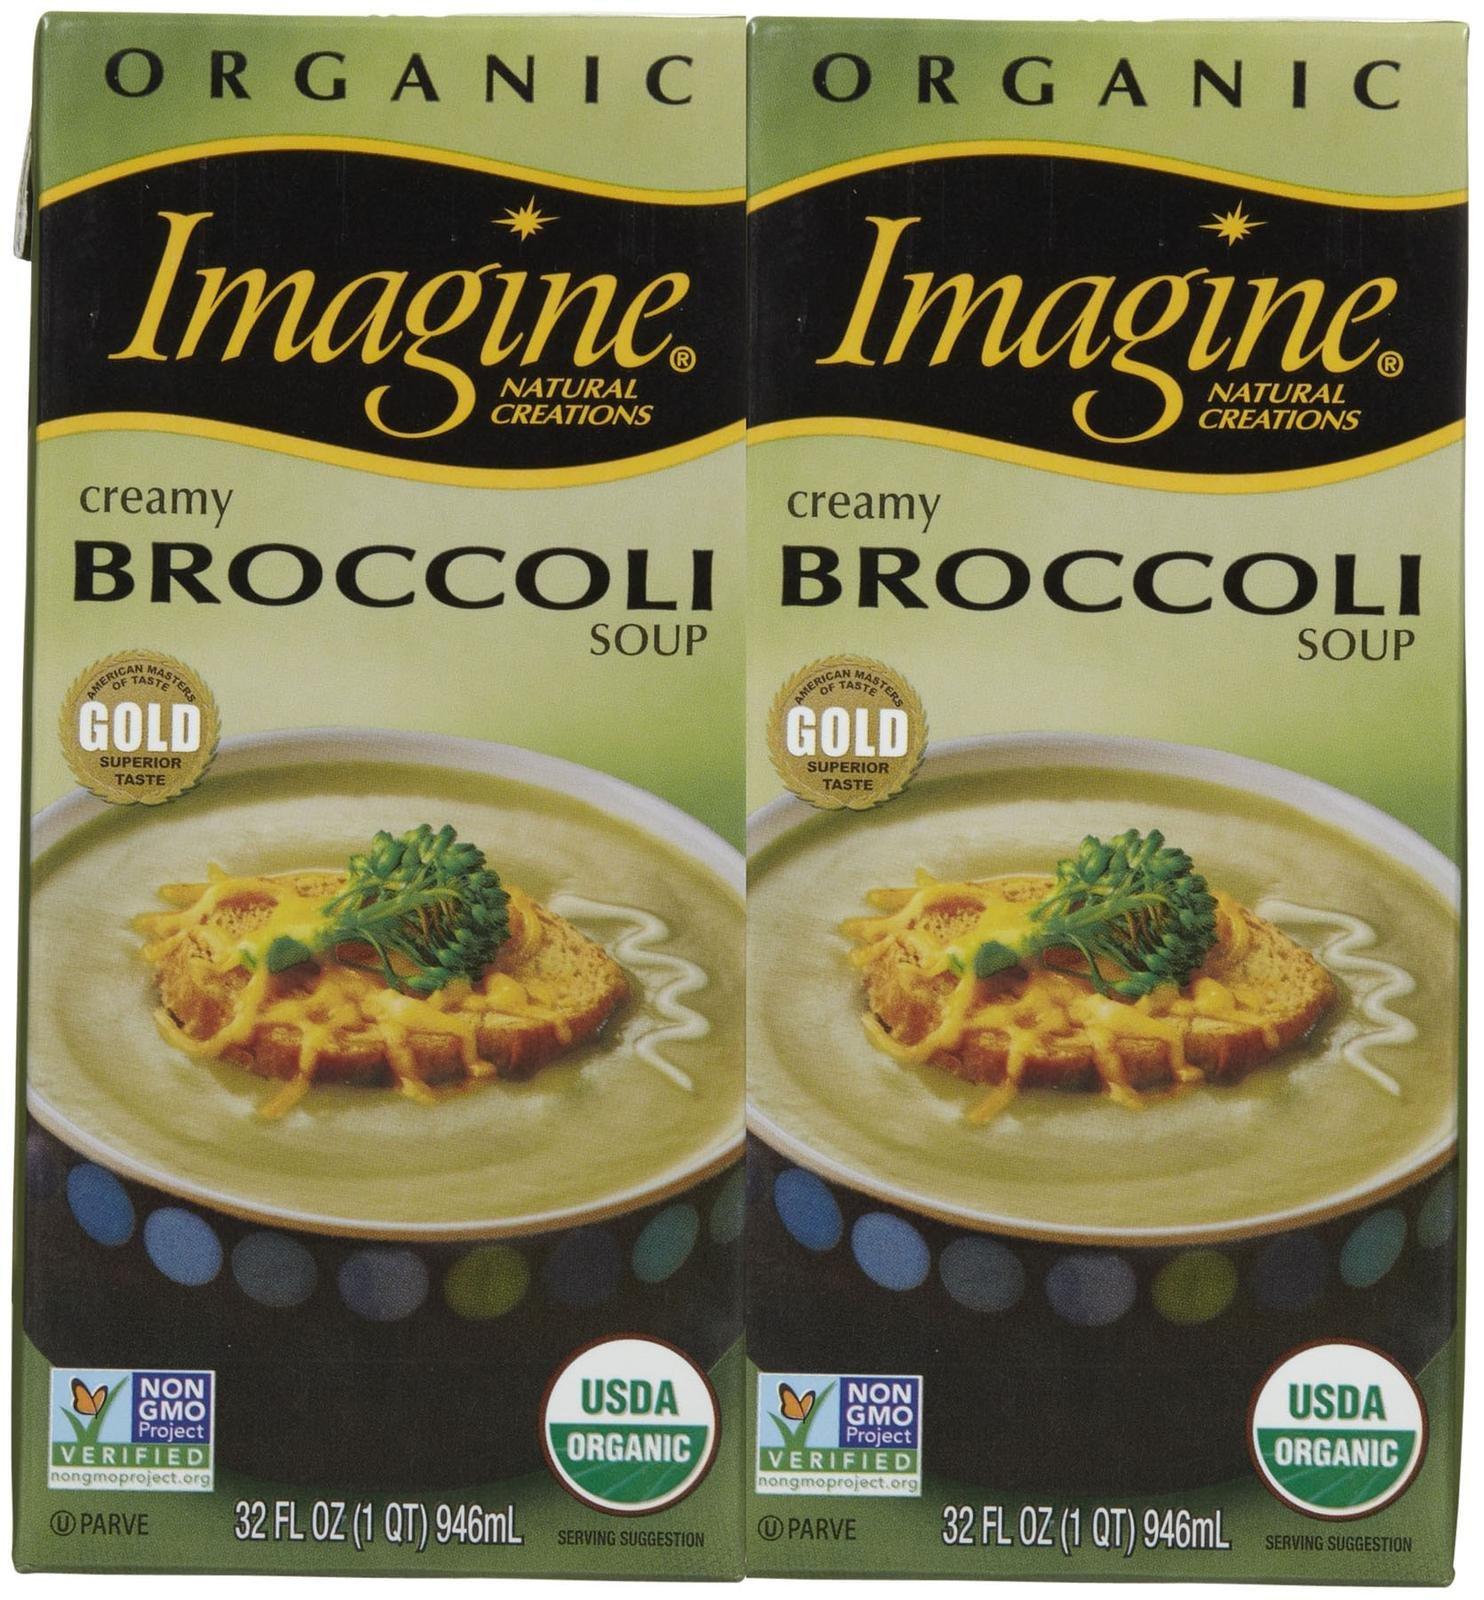 Imagine Organic Creamy Broccoli Soup, 32 oz, 2 pk